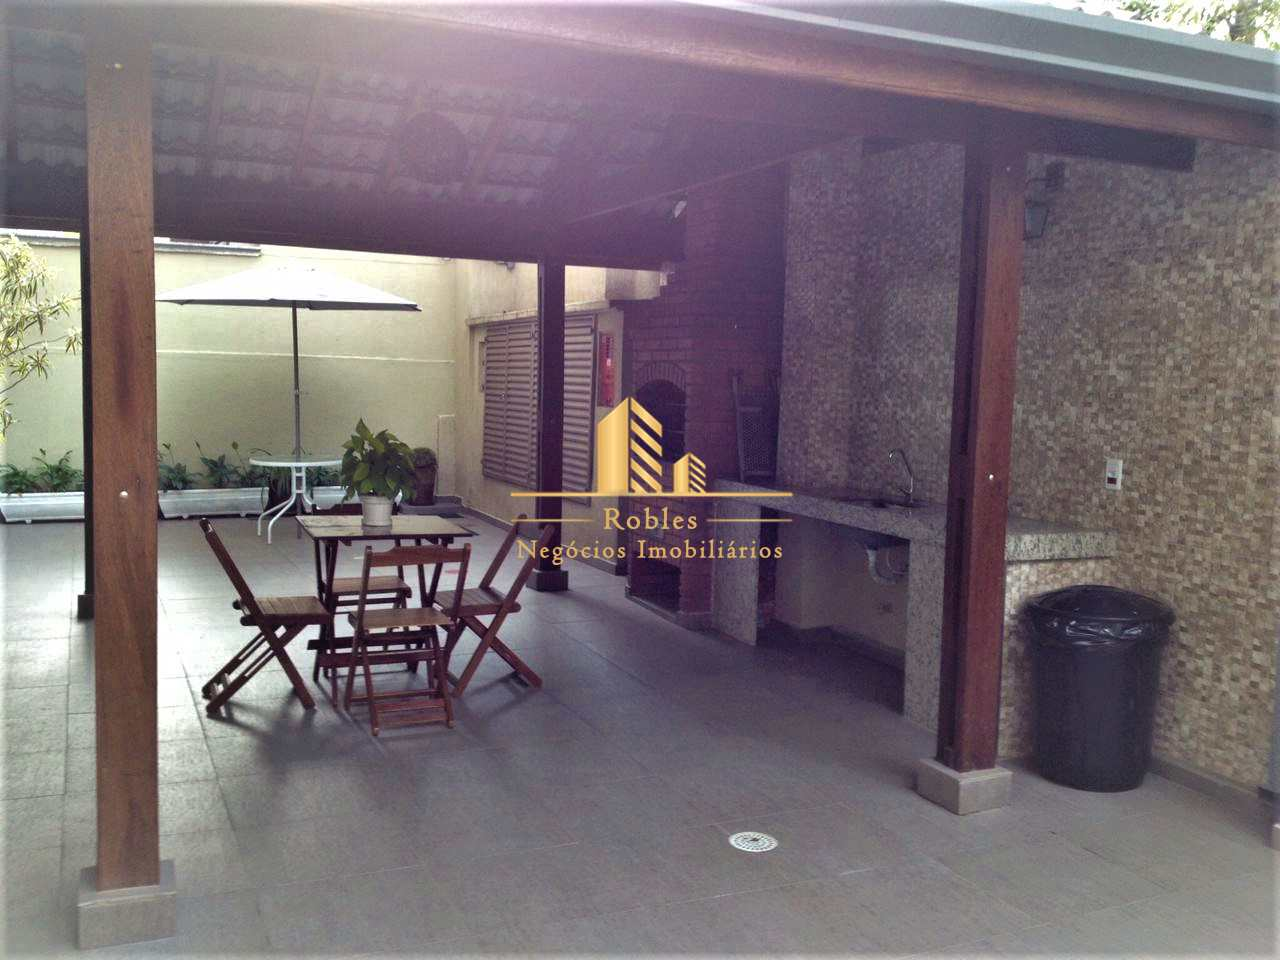 Cobertura com 2 dorms, Morumbi, São Paulo - R$ 495 mil, Cod: 453